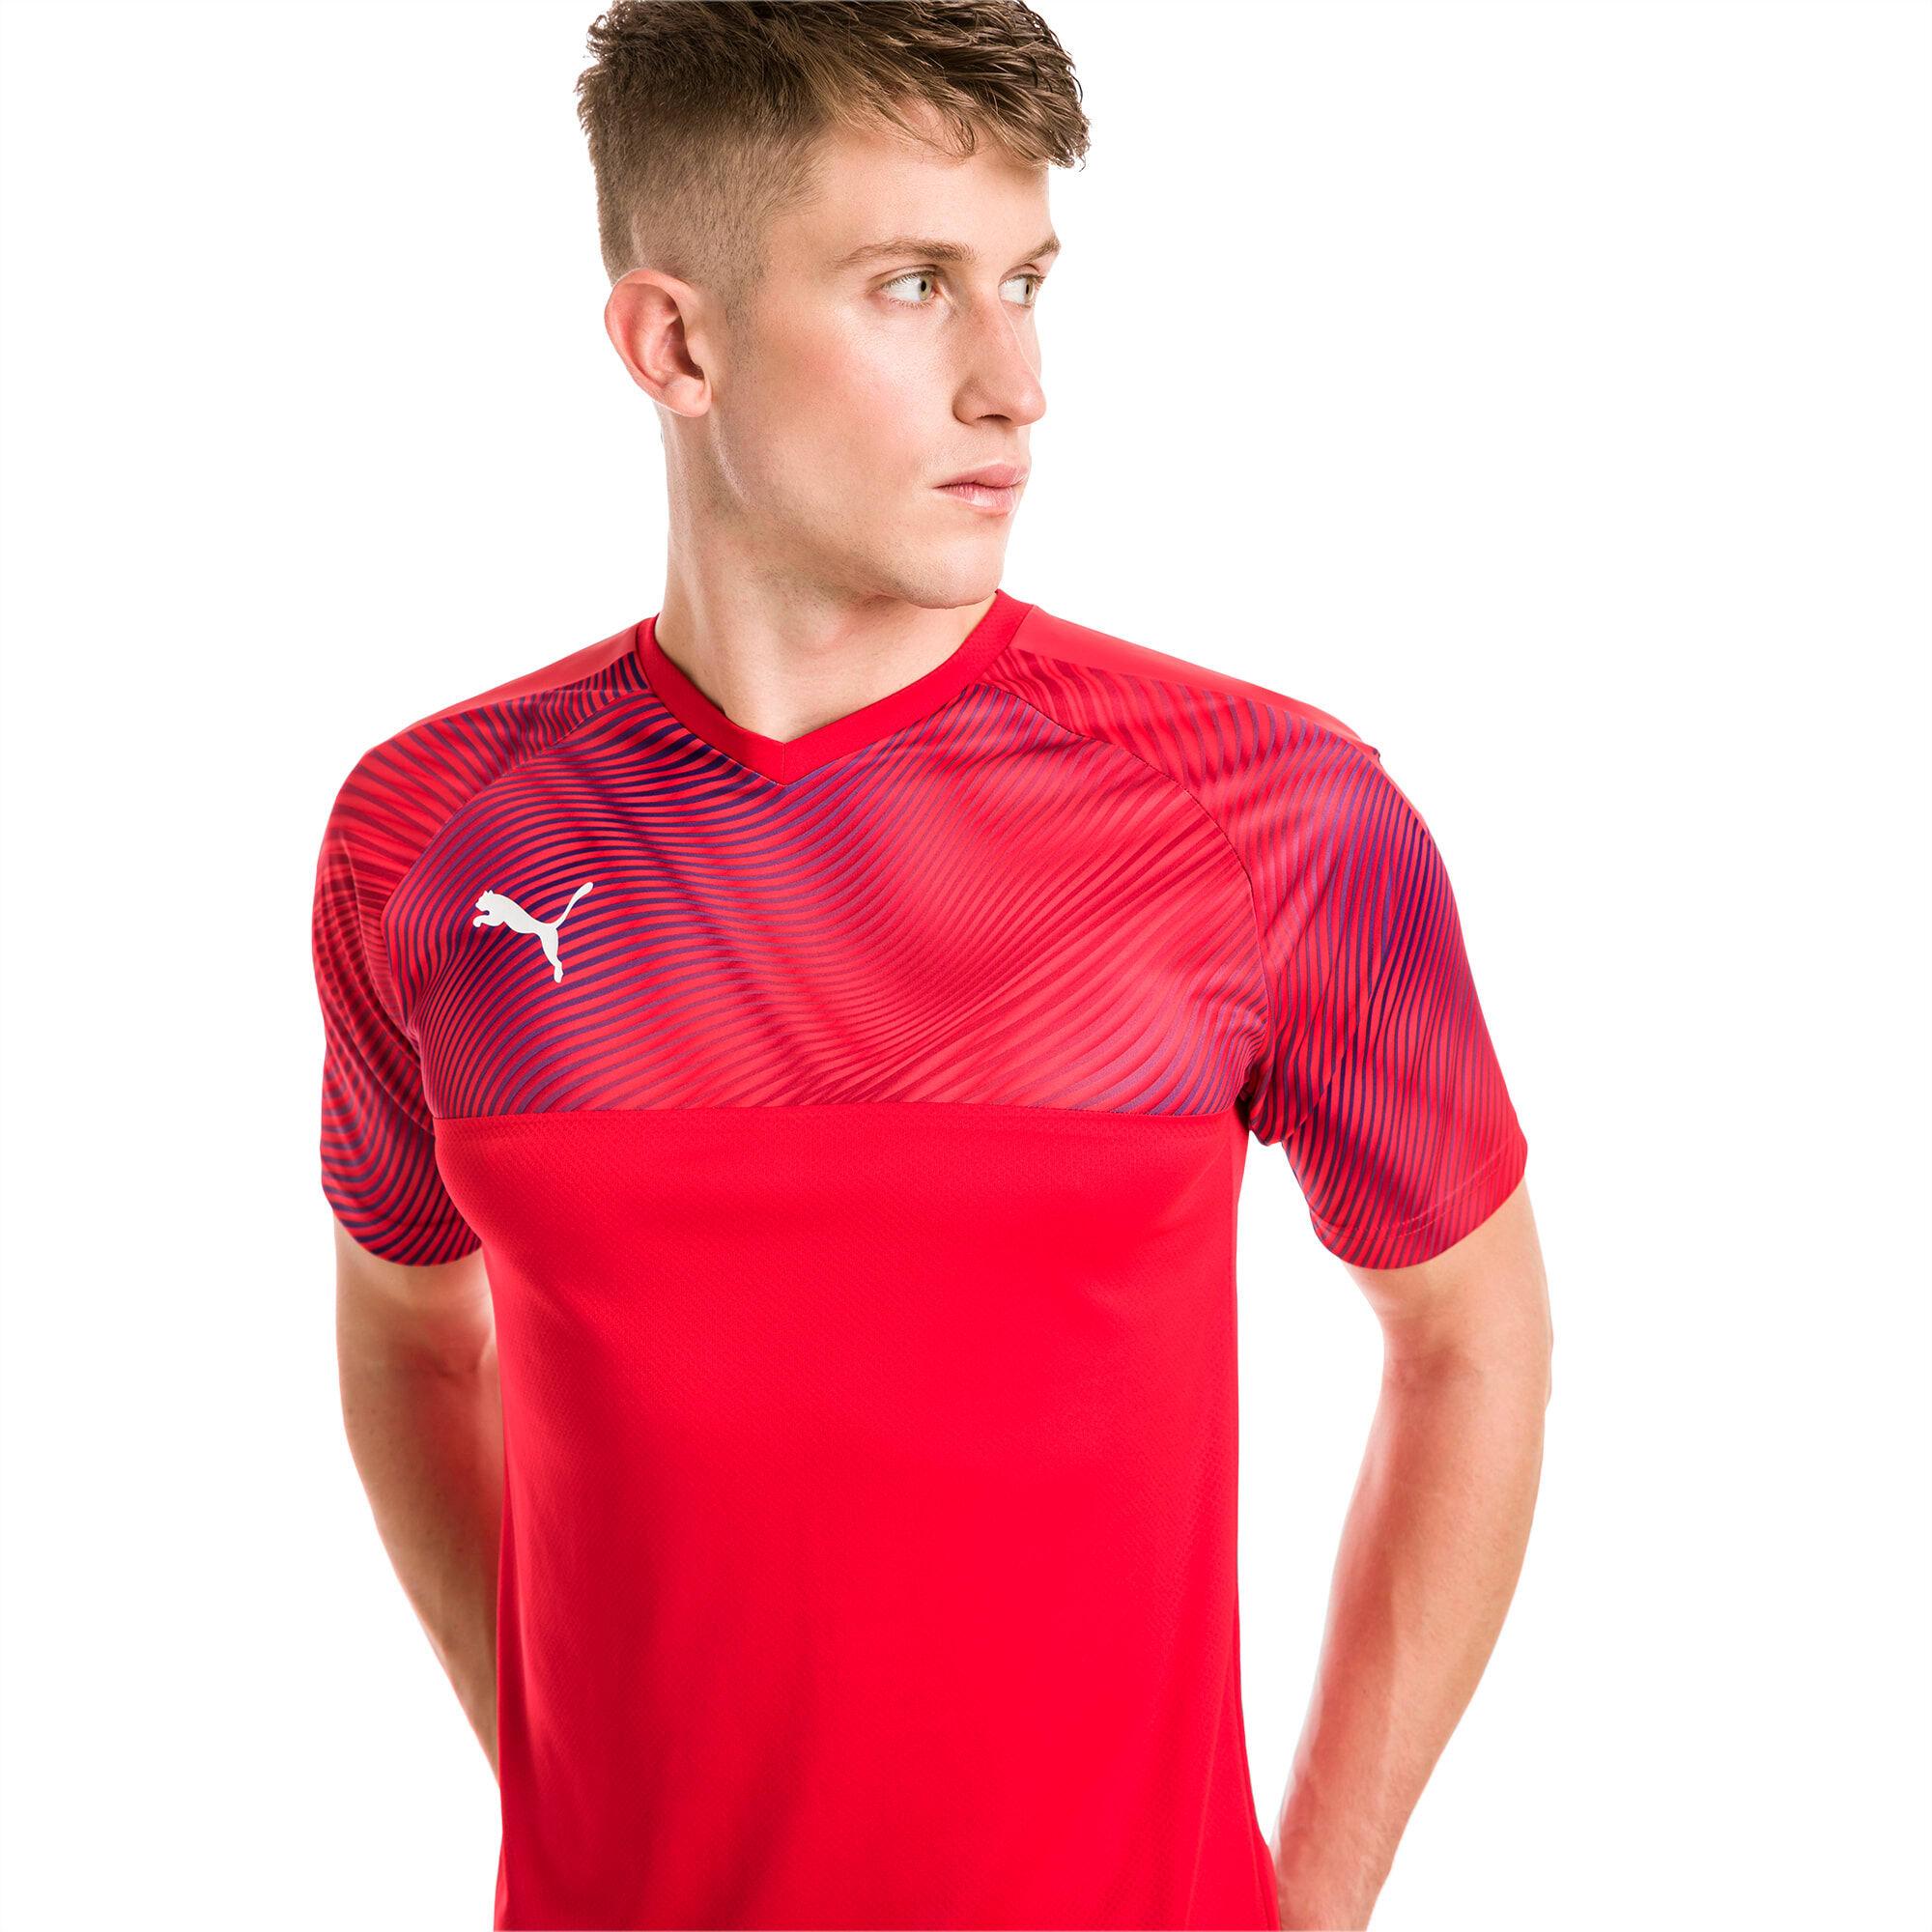 PUMA Maillot Football CUP pour Homme, Rouge/Blanc, Taille 4XL, Vêtements